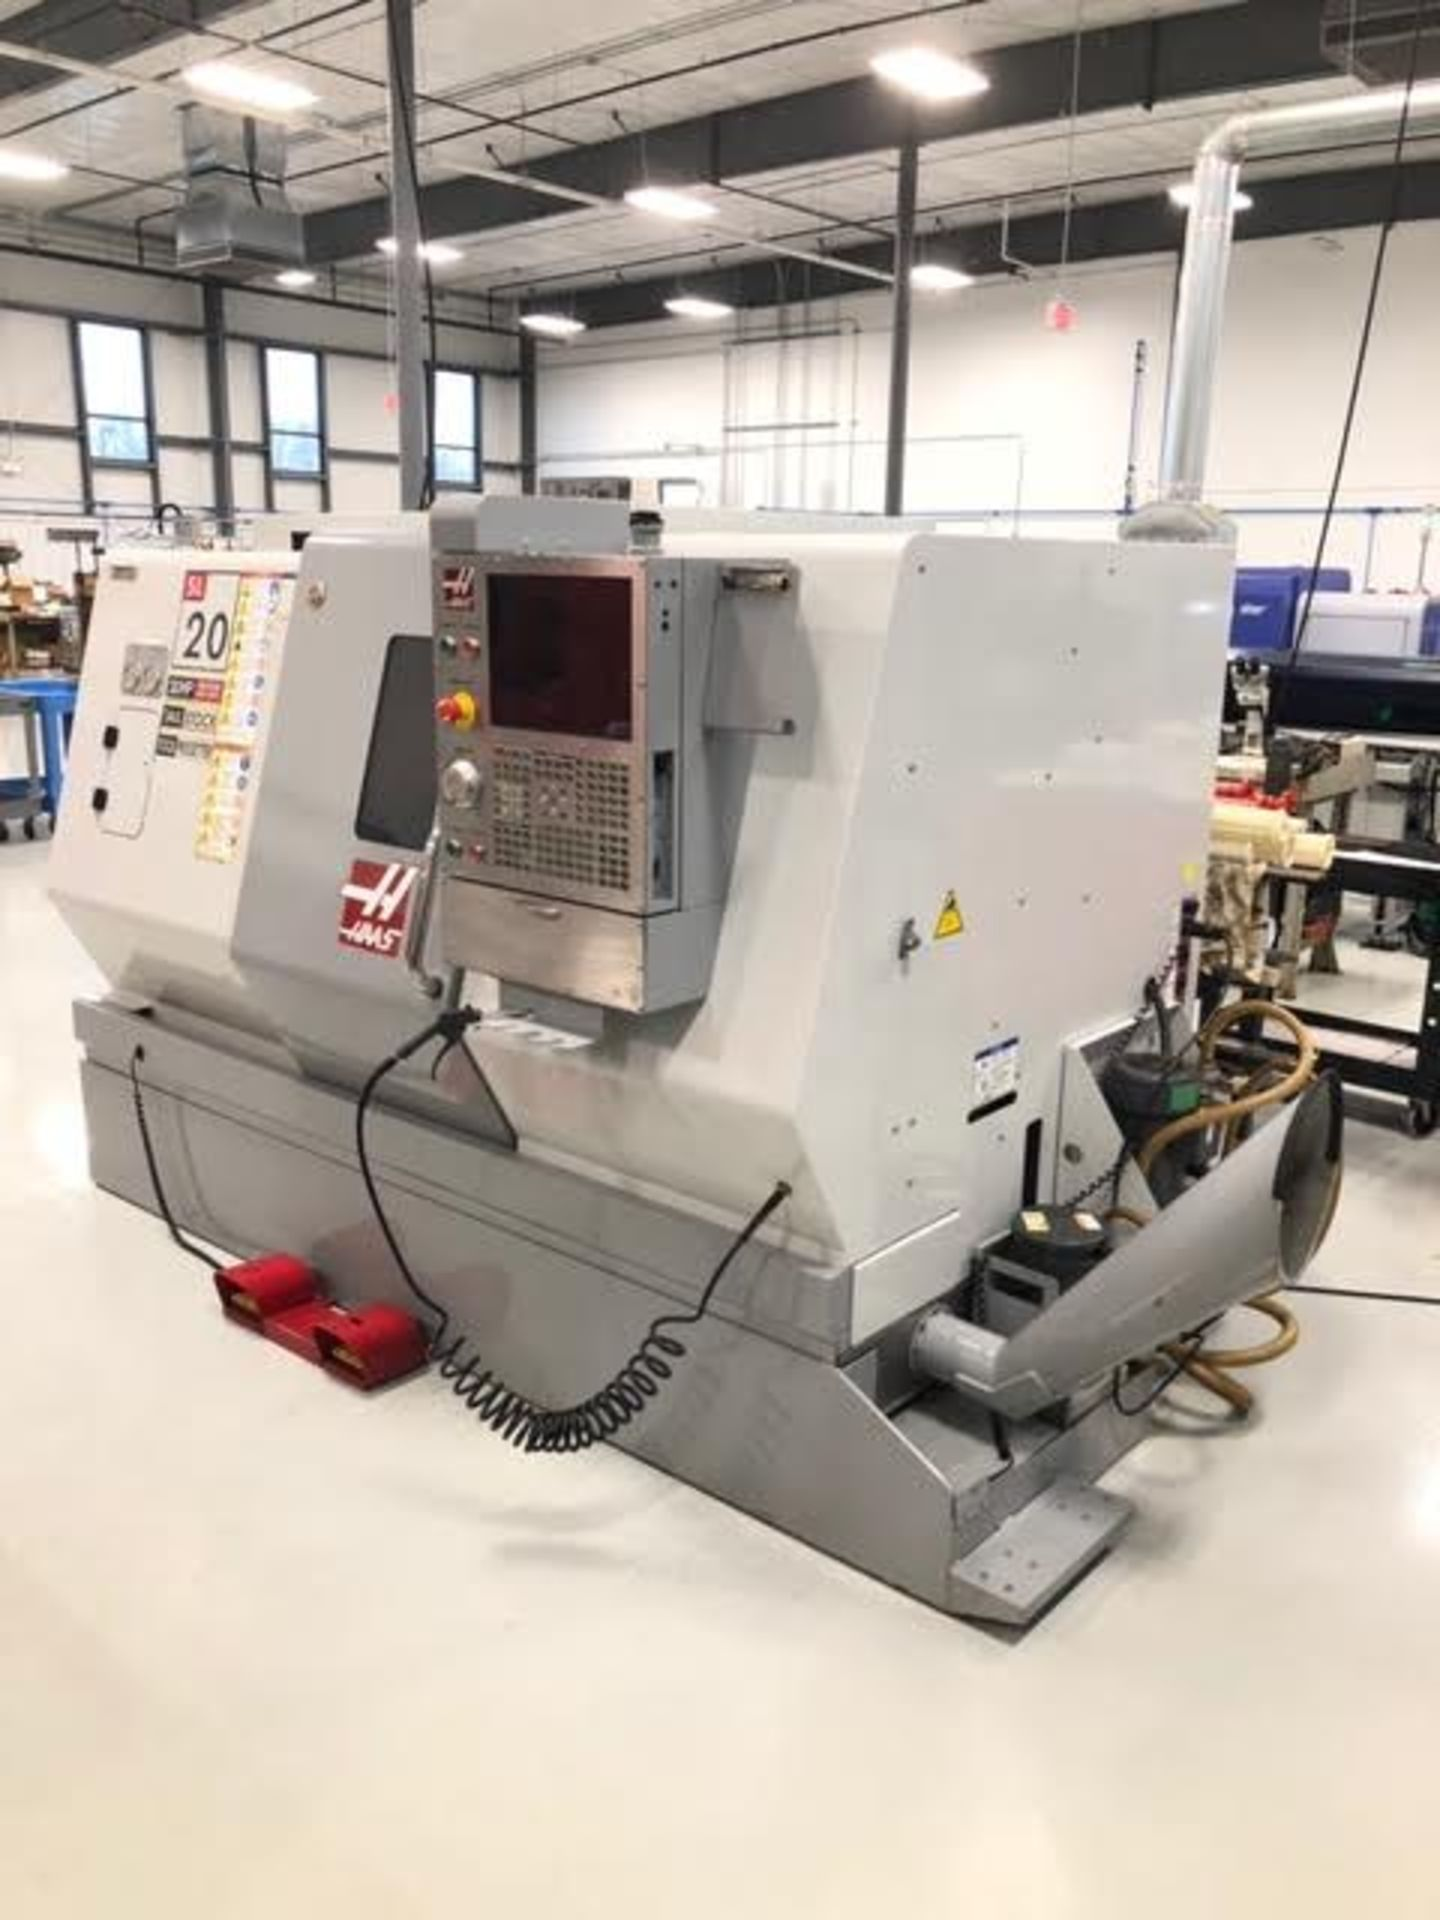 Lot 25 - 2009 Haas SL-20T CNC Lathe Milling